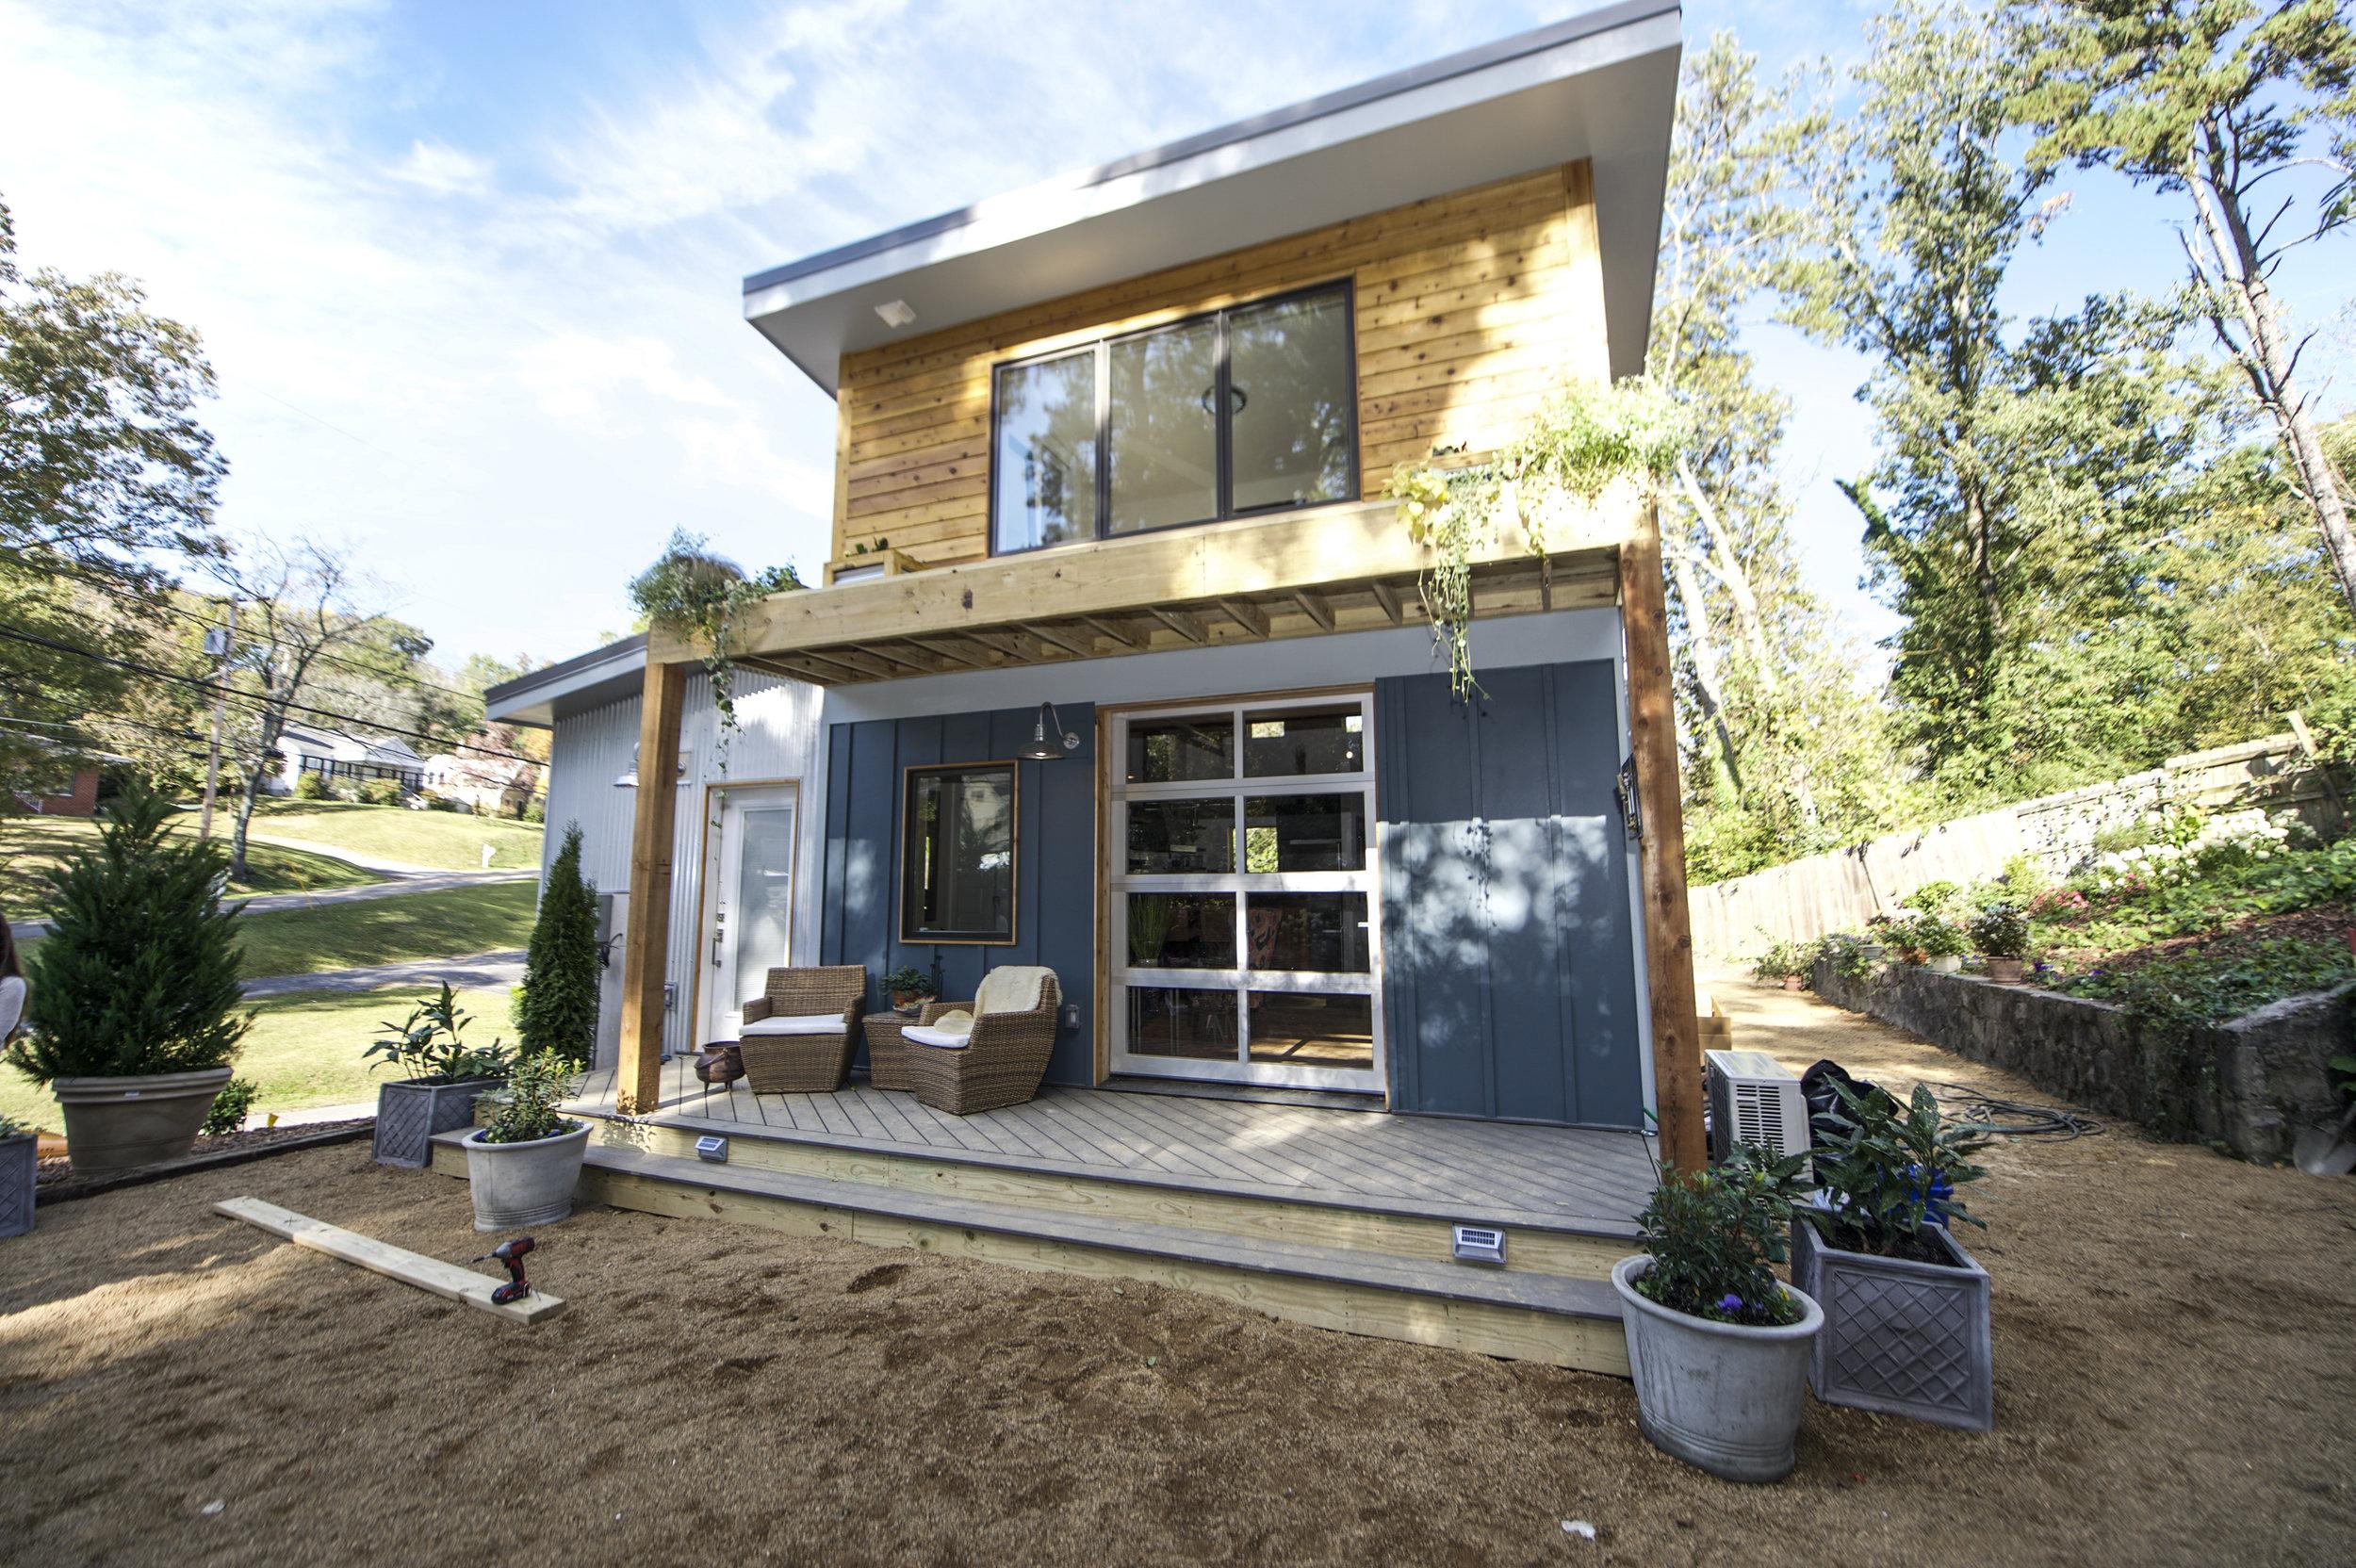 Casement windows in upstairs bedroom, solar powered lights on deck steps, aluminum clad glass pane garage door, cedar siding accents